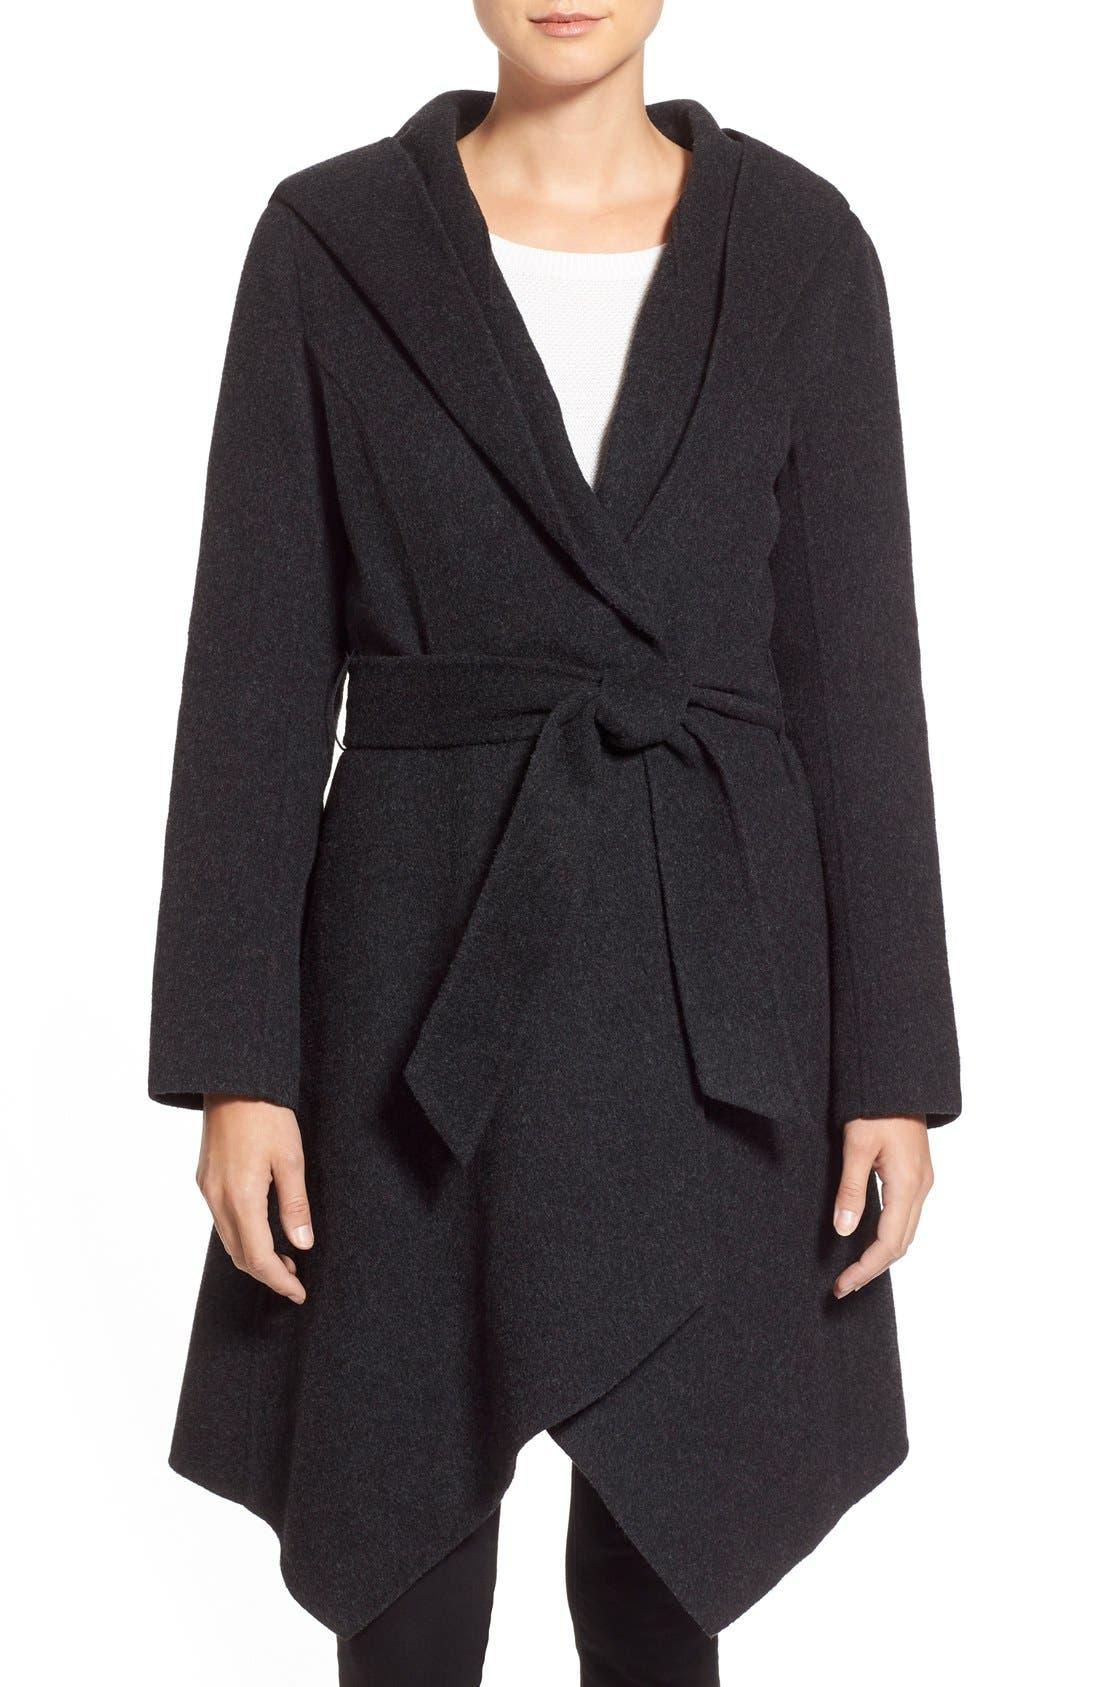 'Sophia' Belted Wool Blend Hooded Asymmetrical Coat,                             Main thumbnail 1, color,                             034